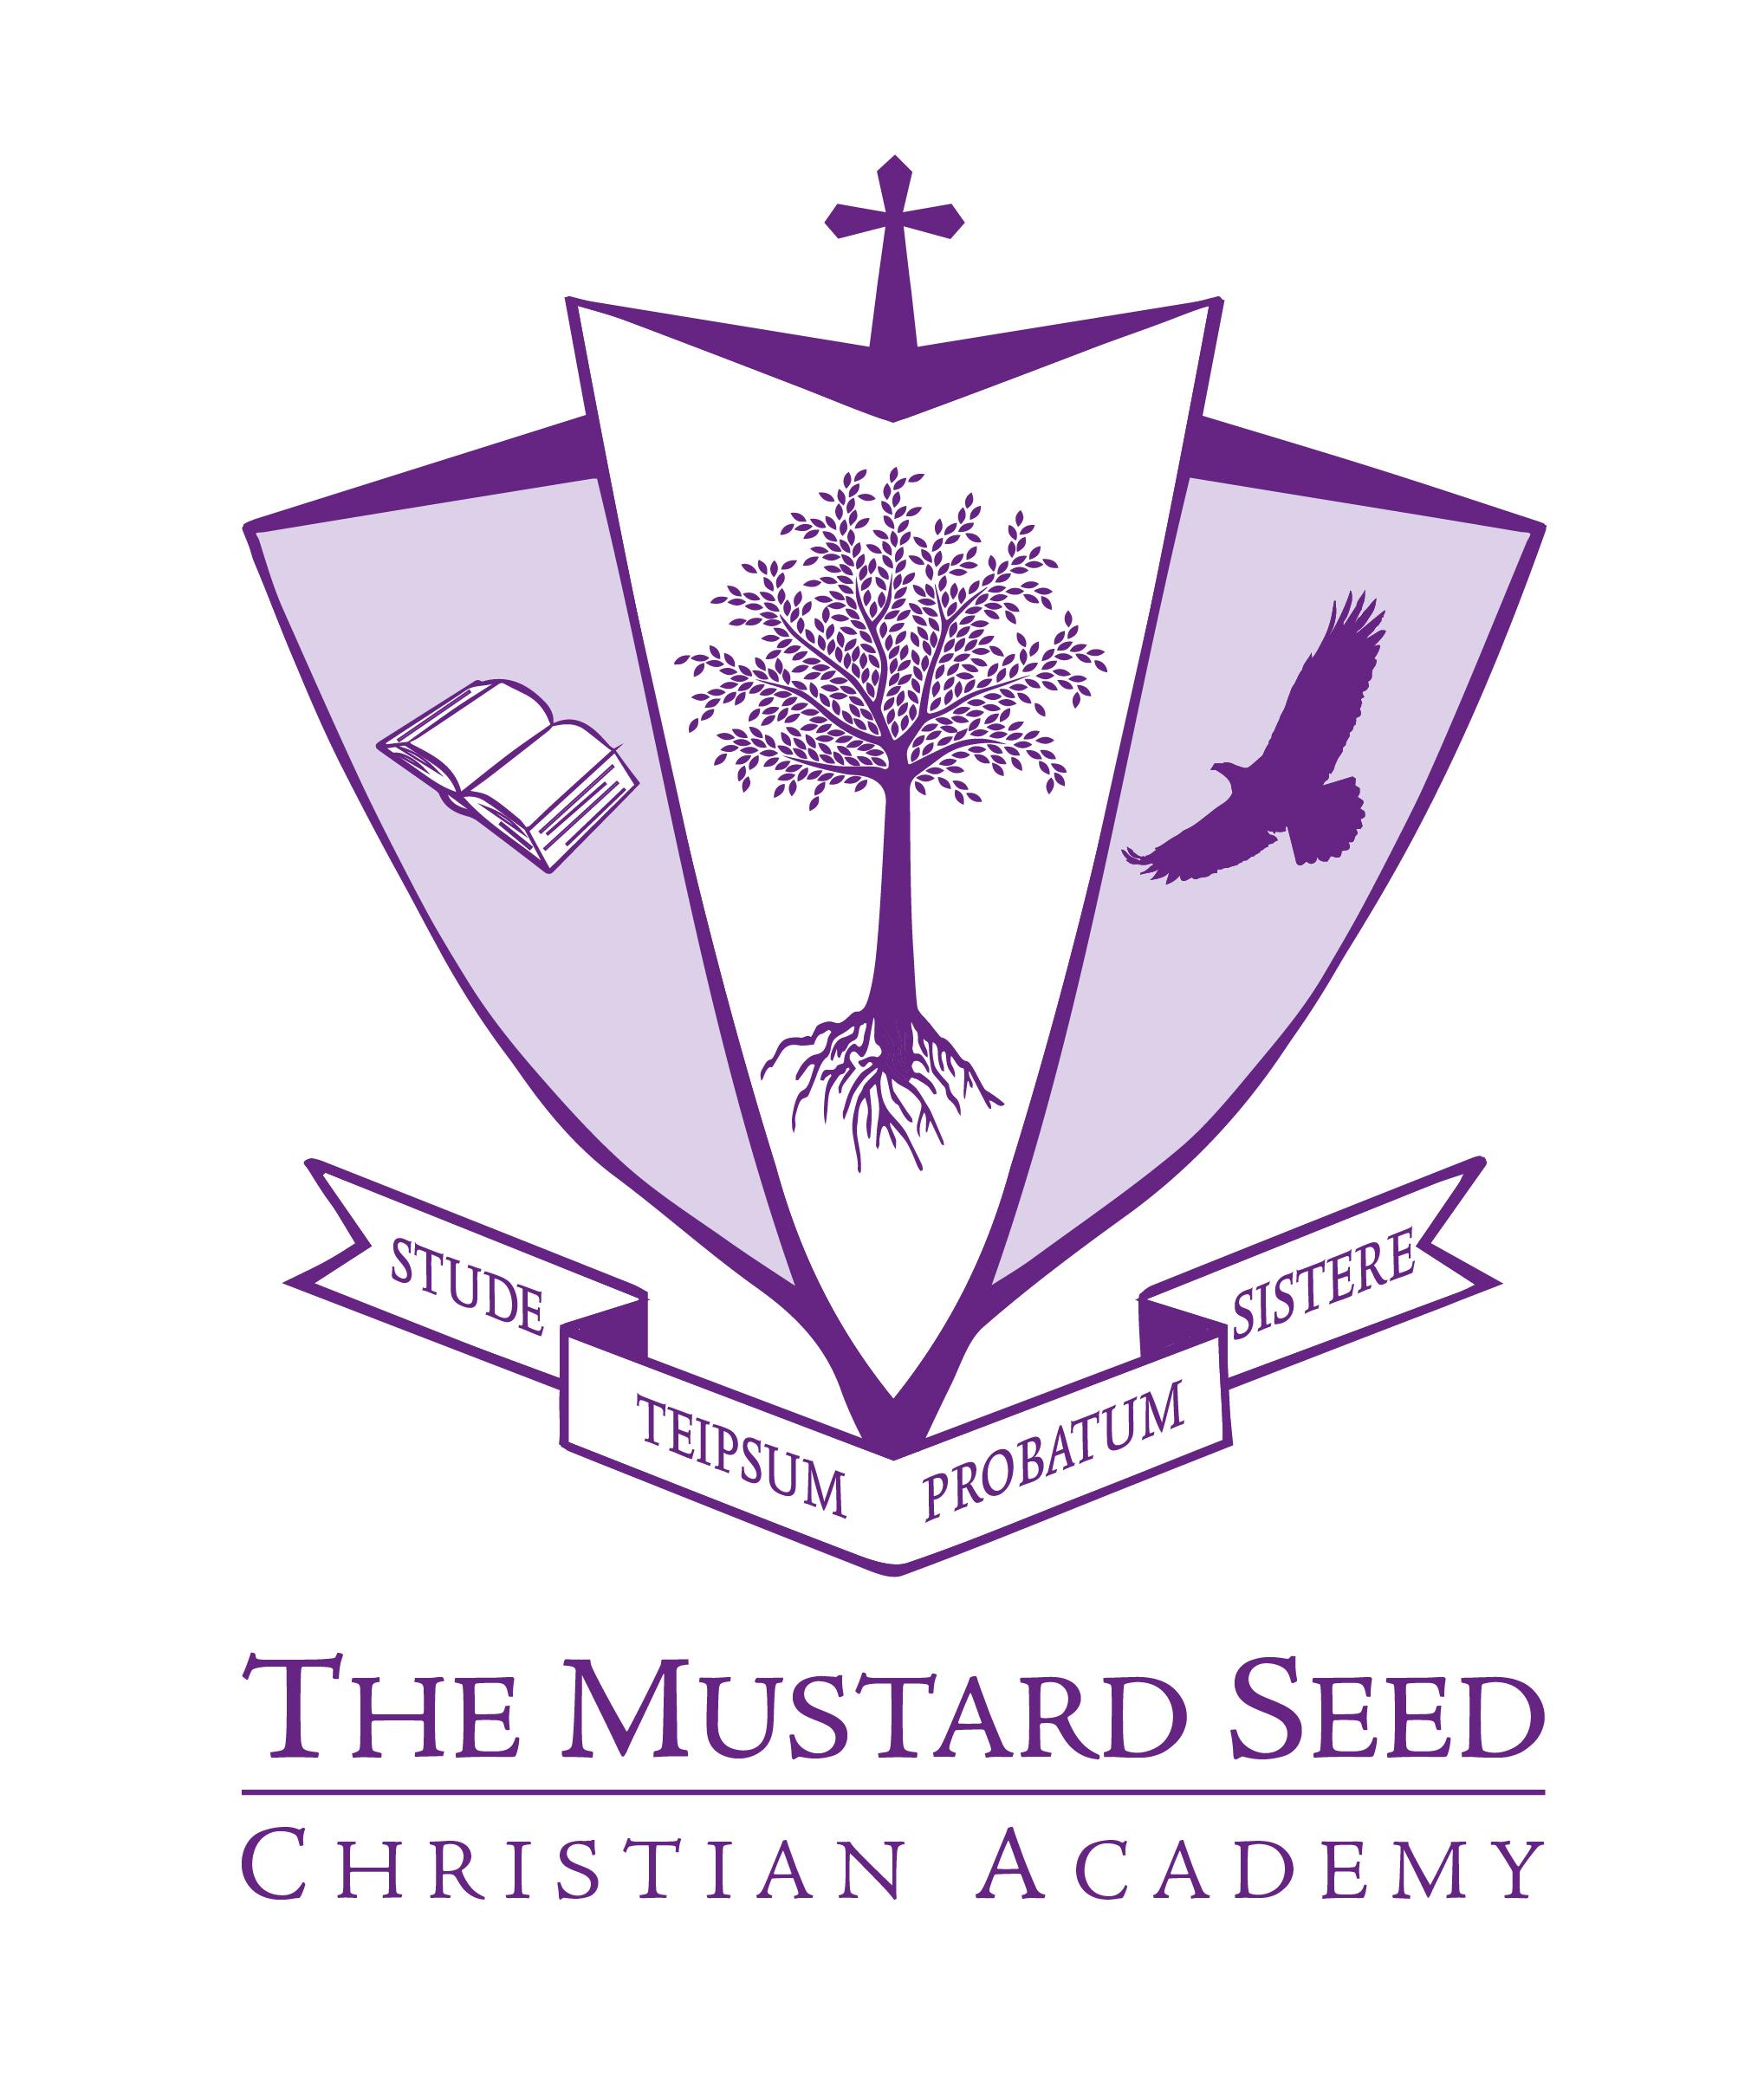 MustardSeedCC-01